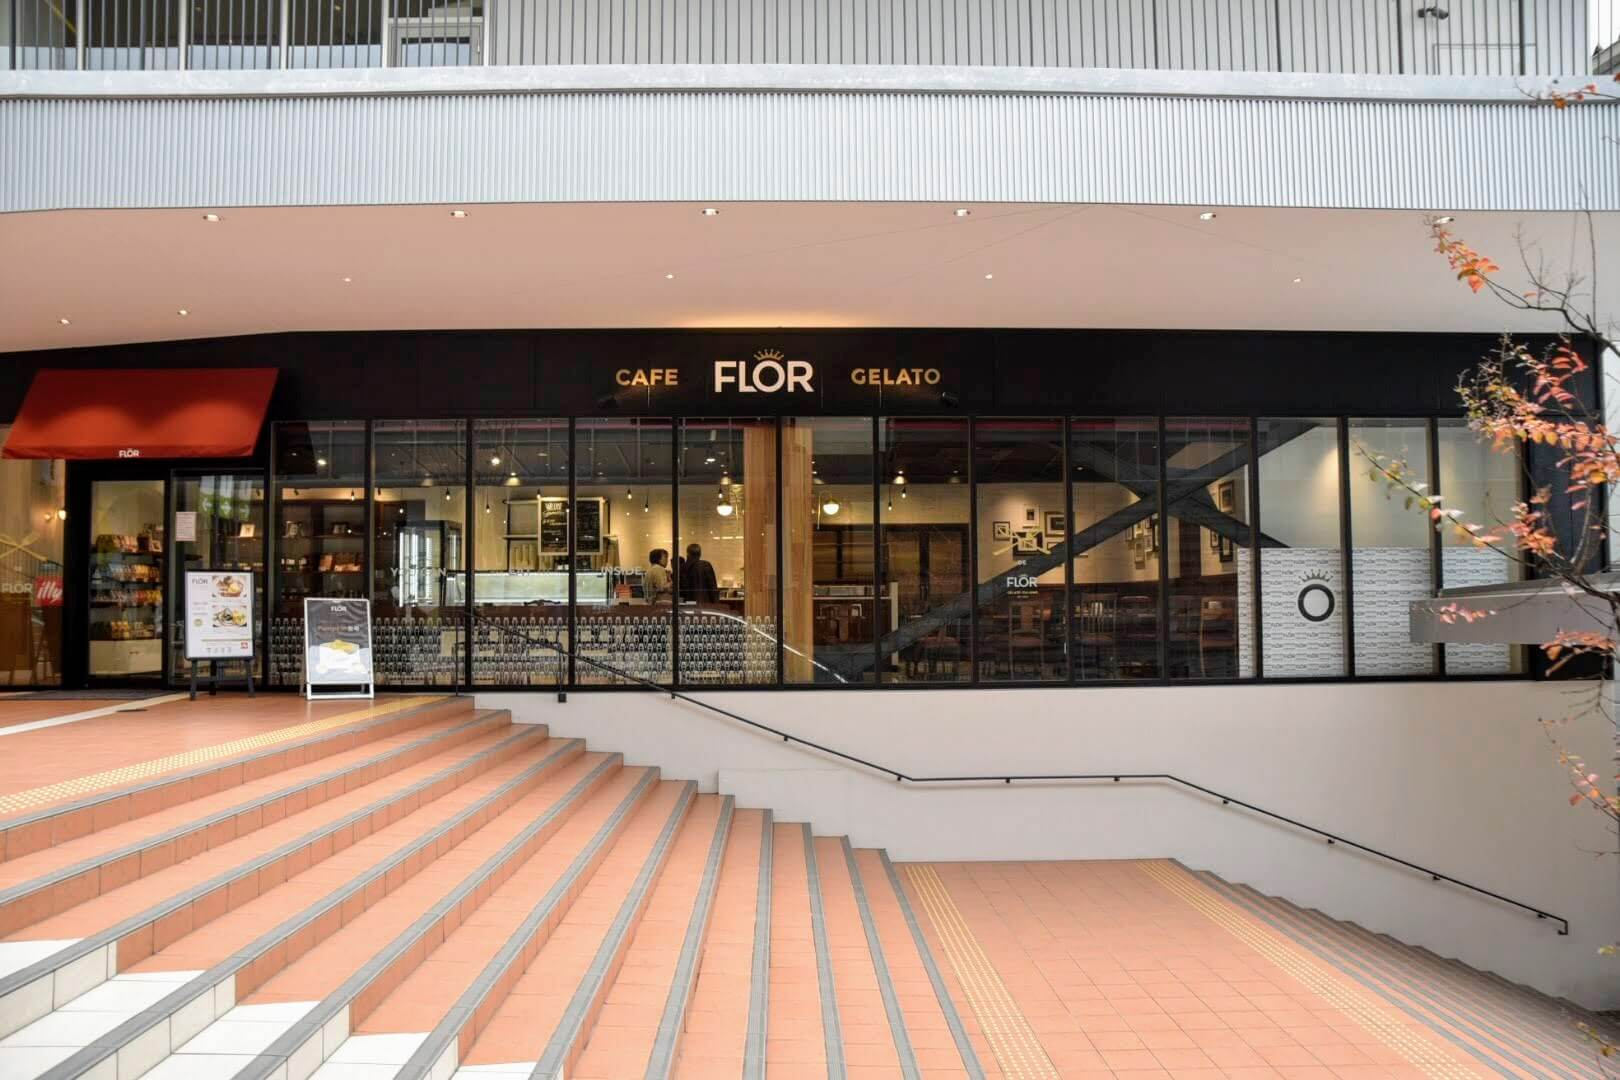 CAFE FLOR GELATOの店舗情報